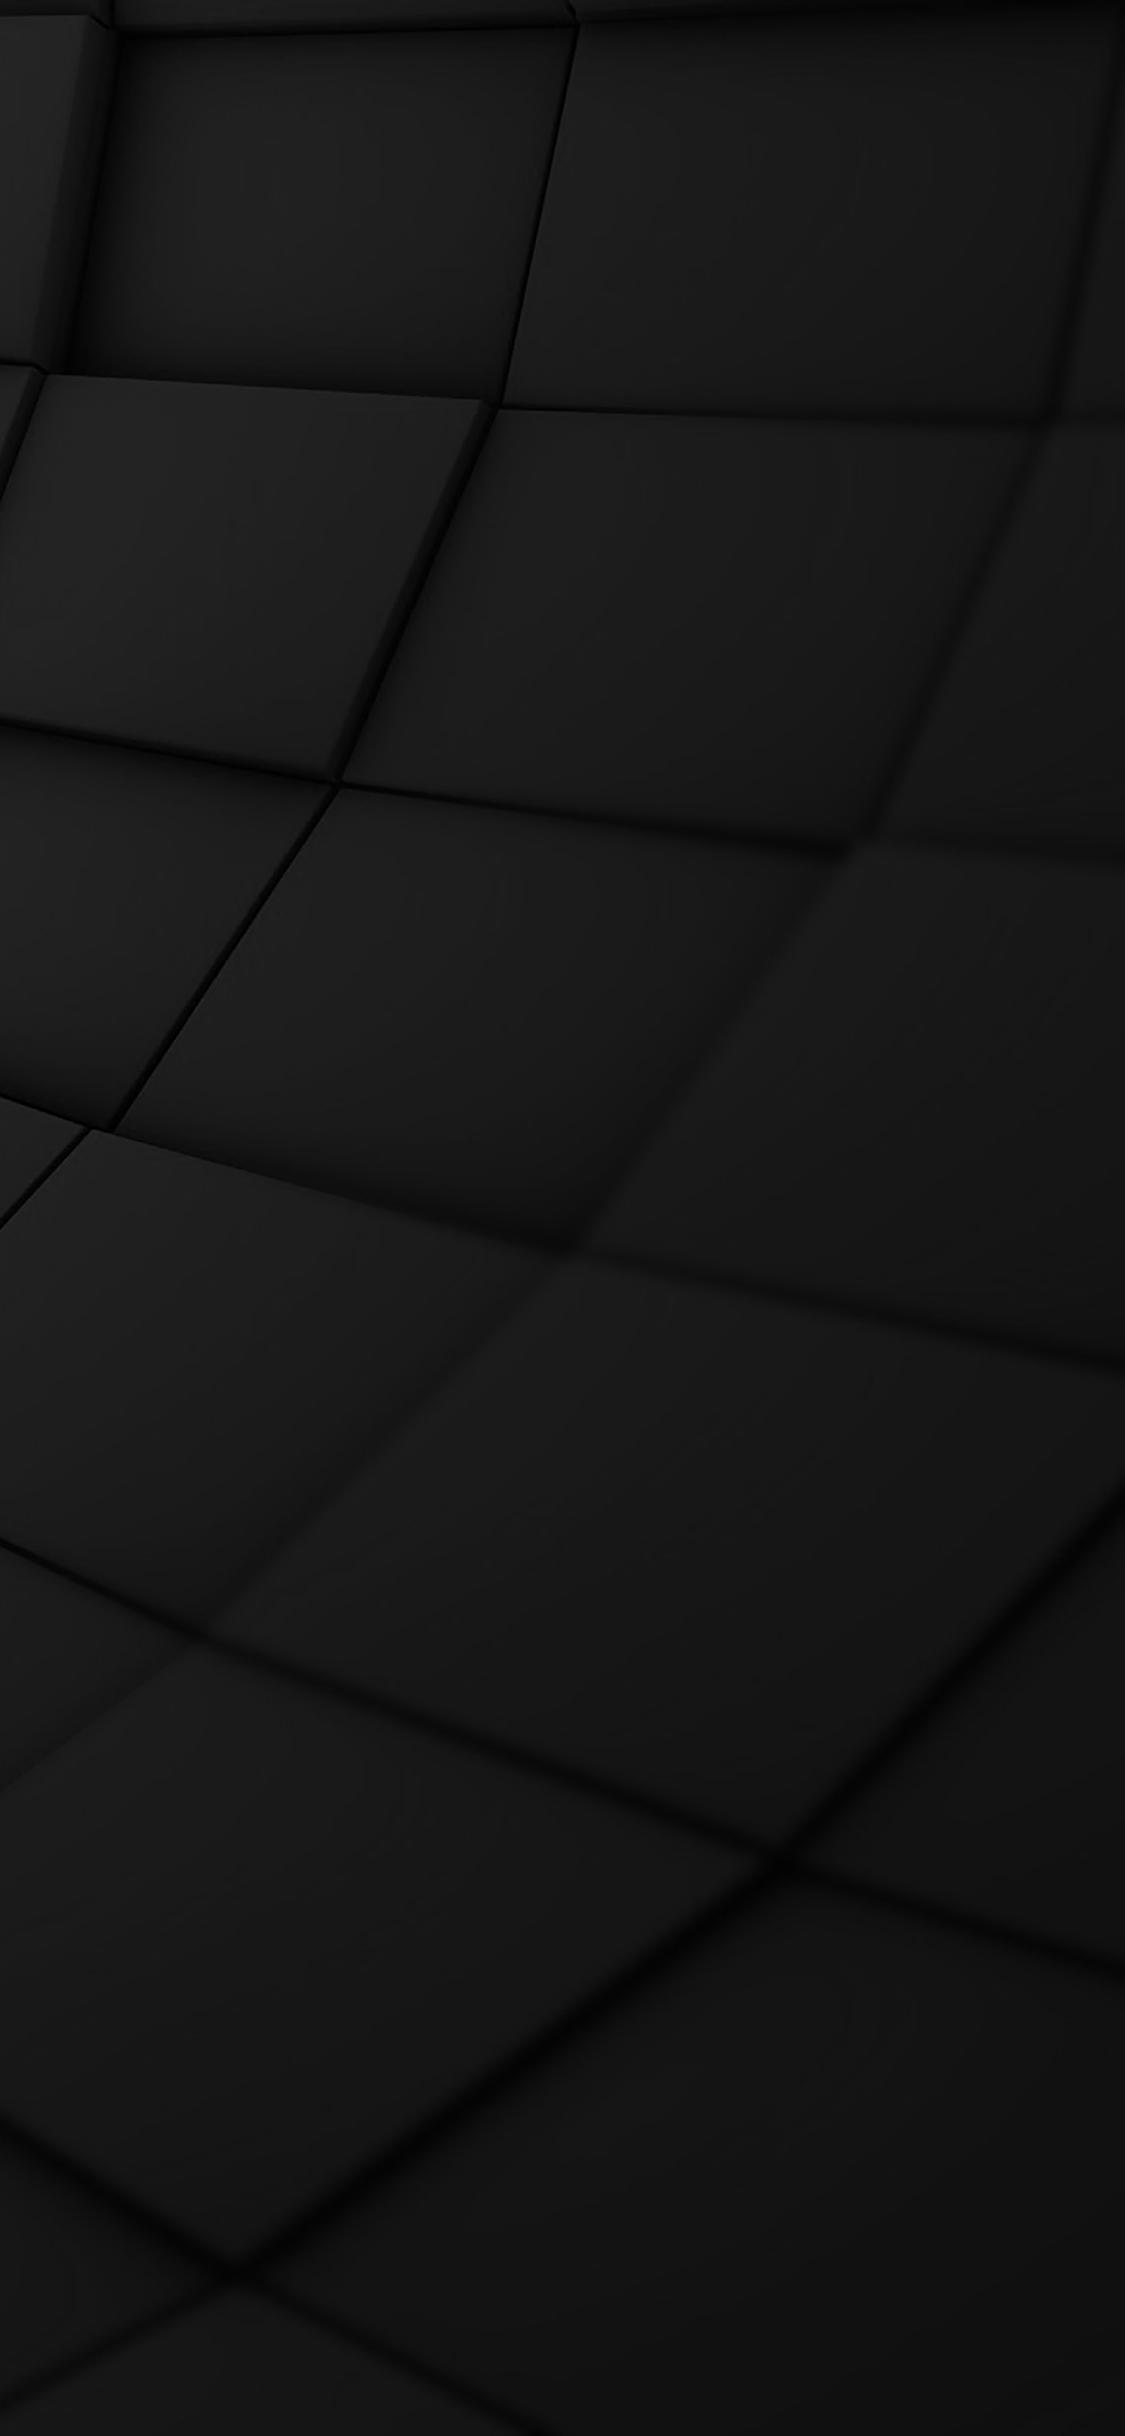 iPhoneXpapers.com-Apple-iPhone-wallpaper-vb27-wallpaper-brick-3ds-black-pattern